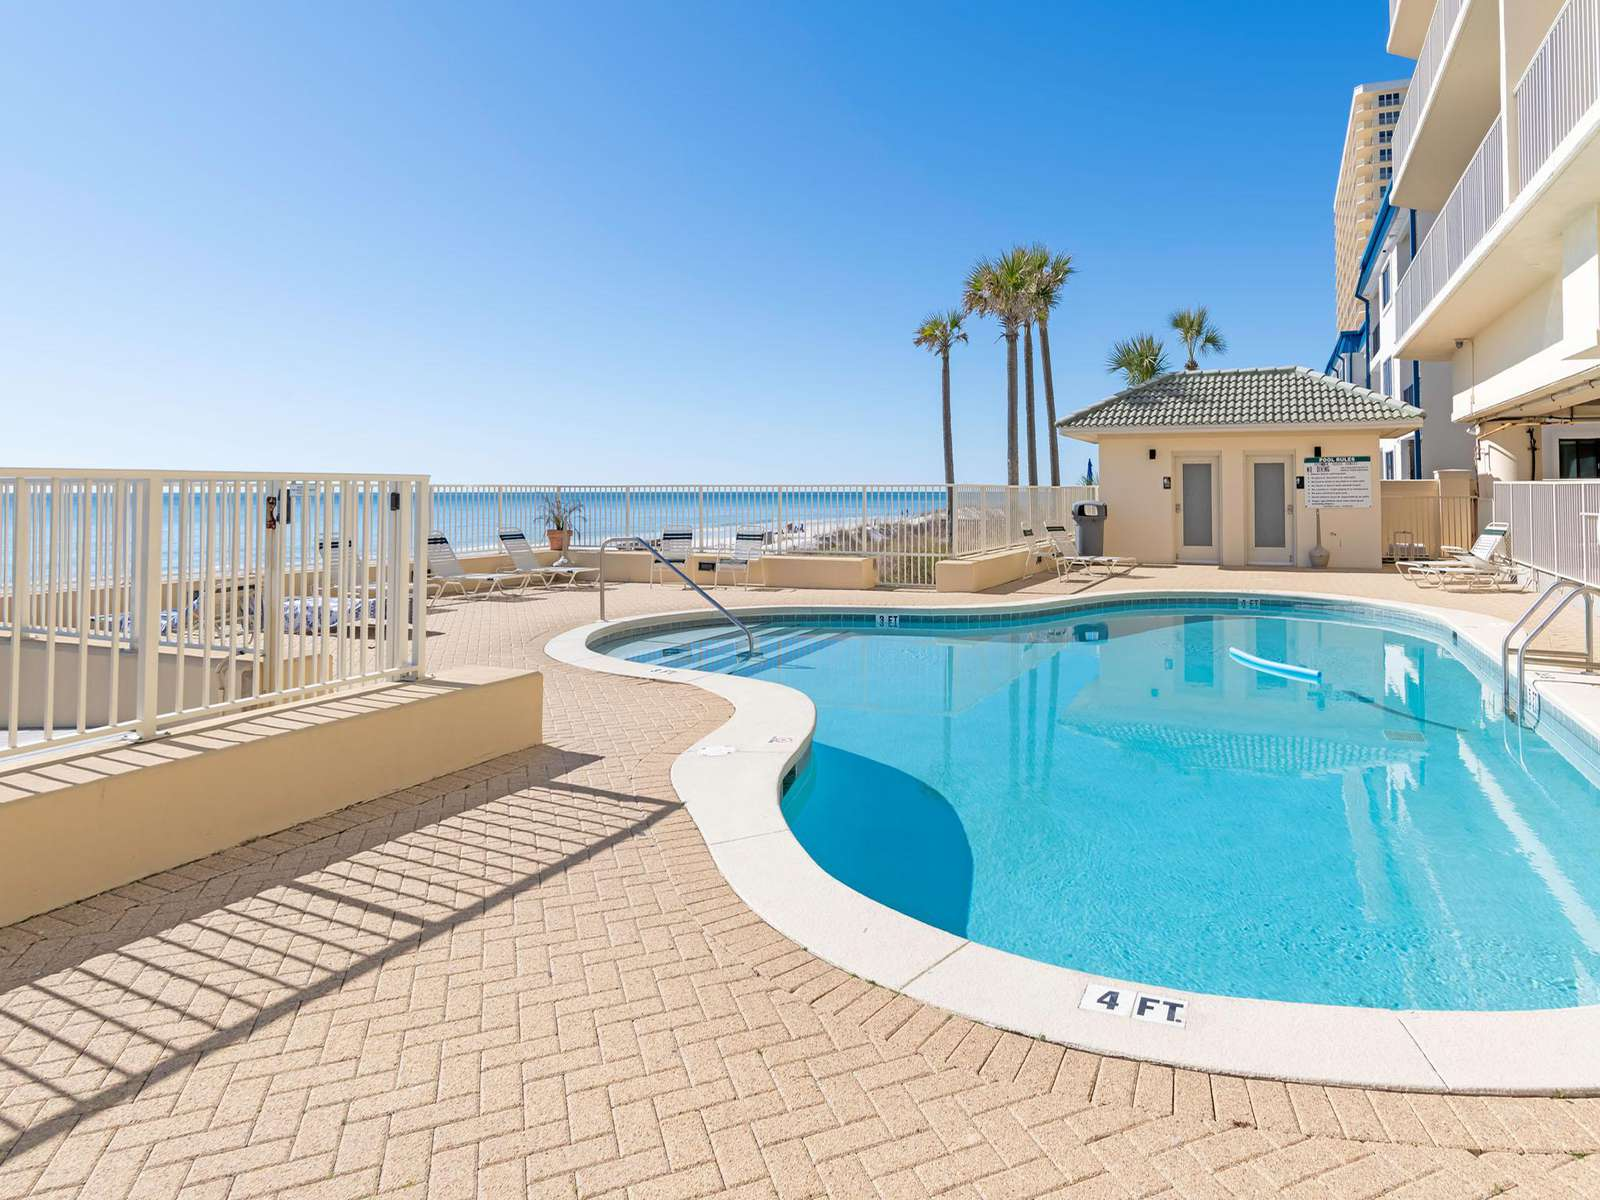 Seasonally heated pool and restrooms!